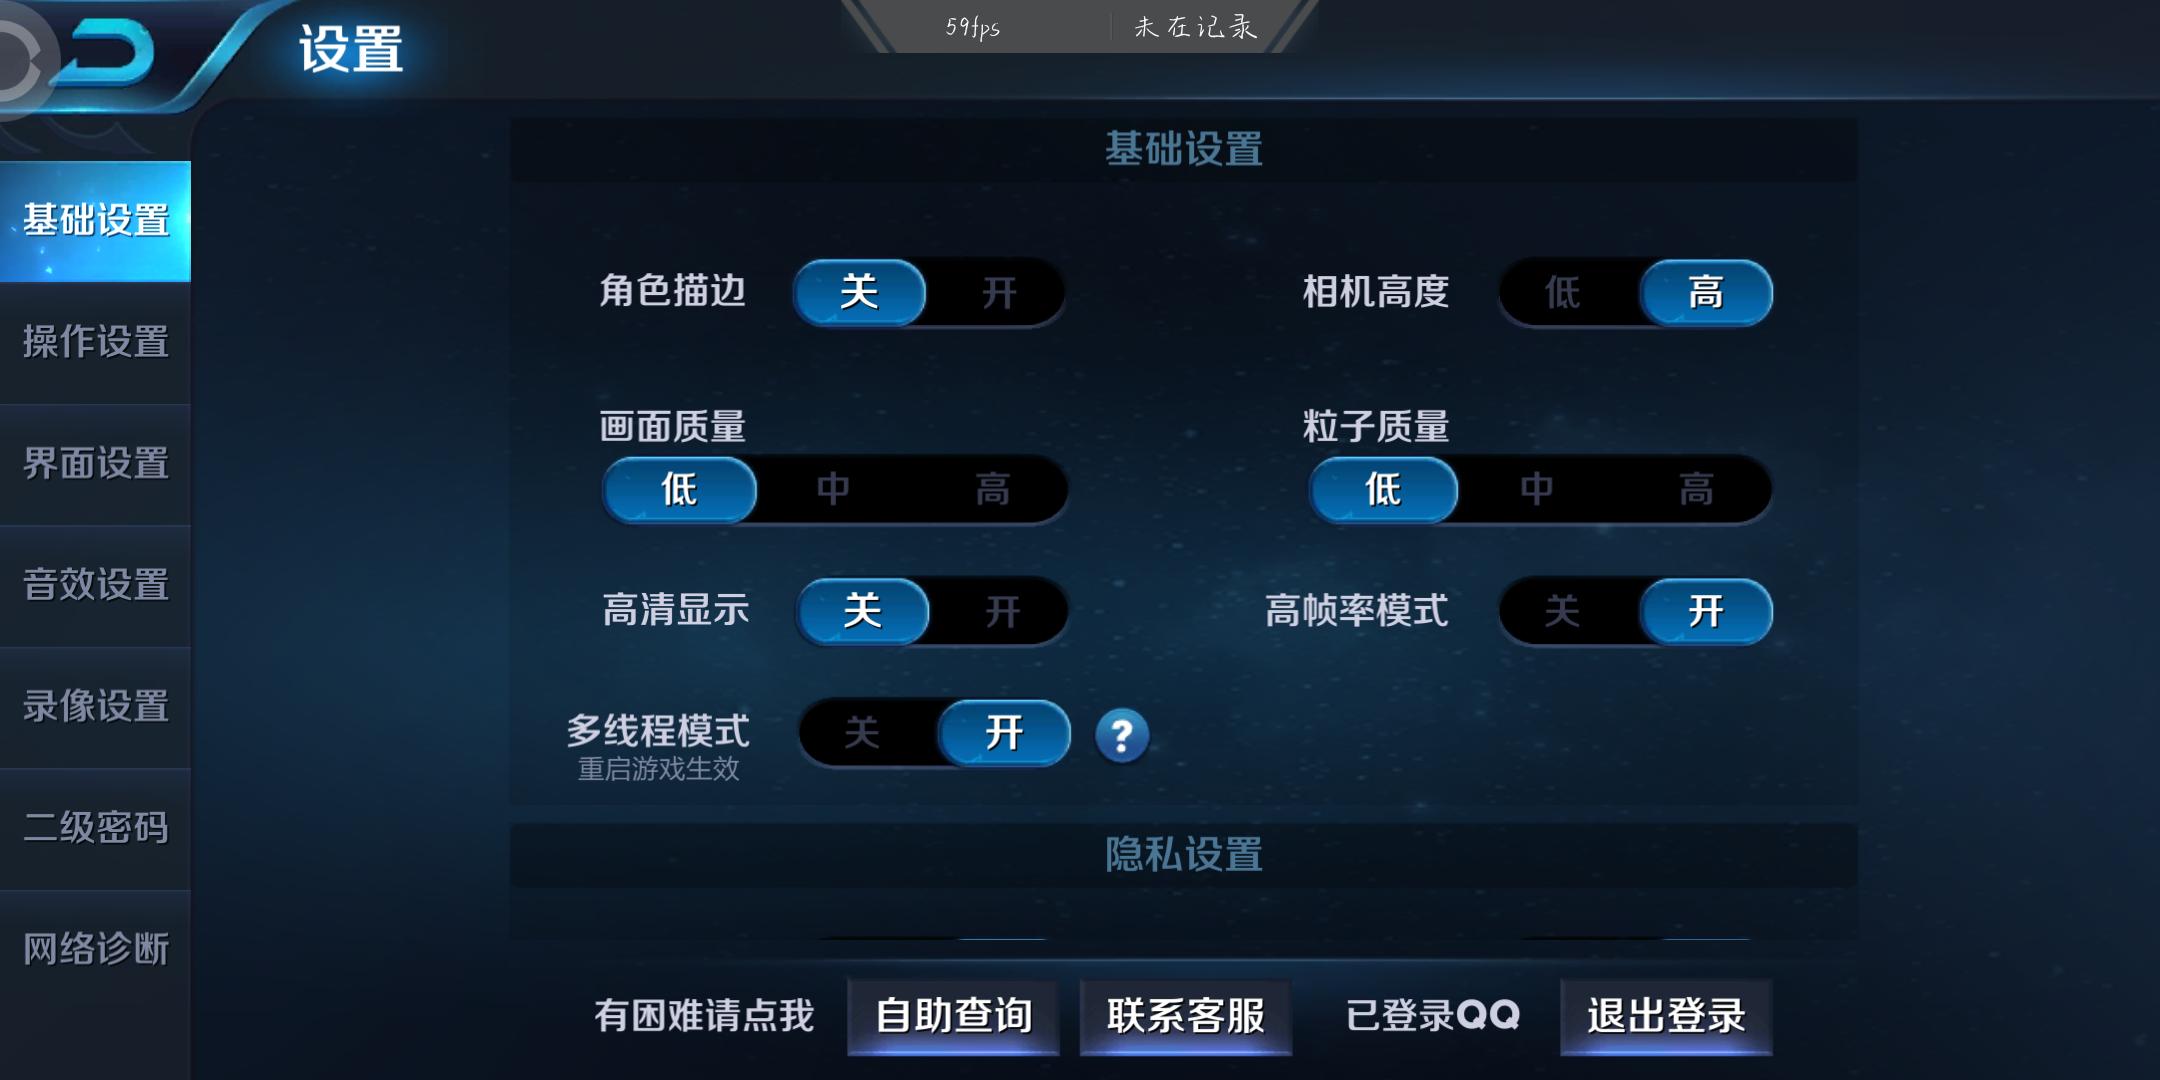 Screenshot_2018-11-17-23-56-40.png